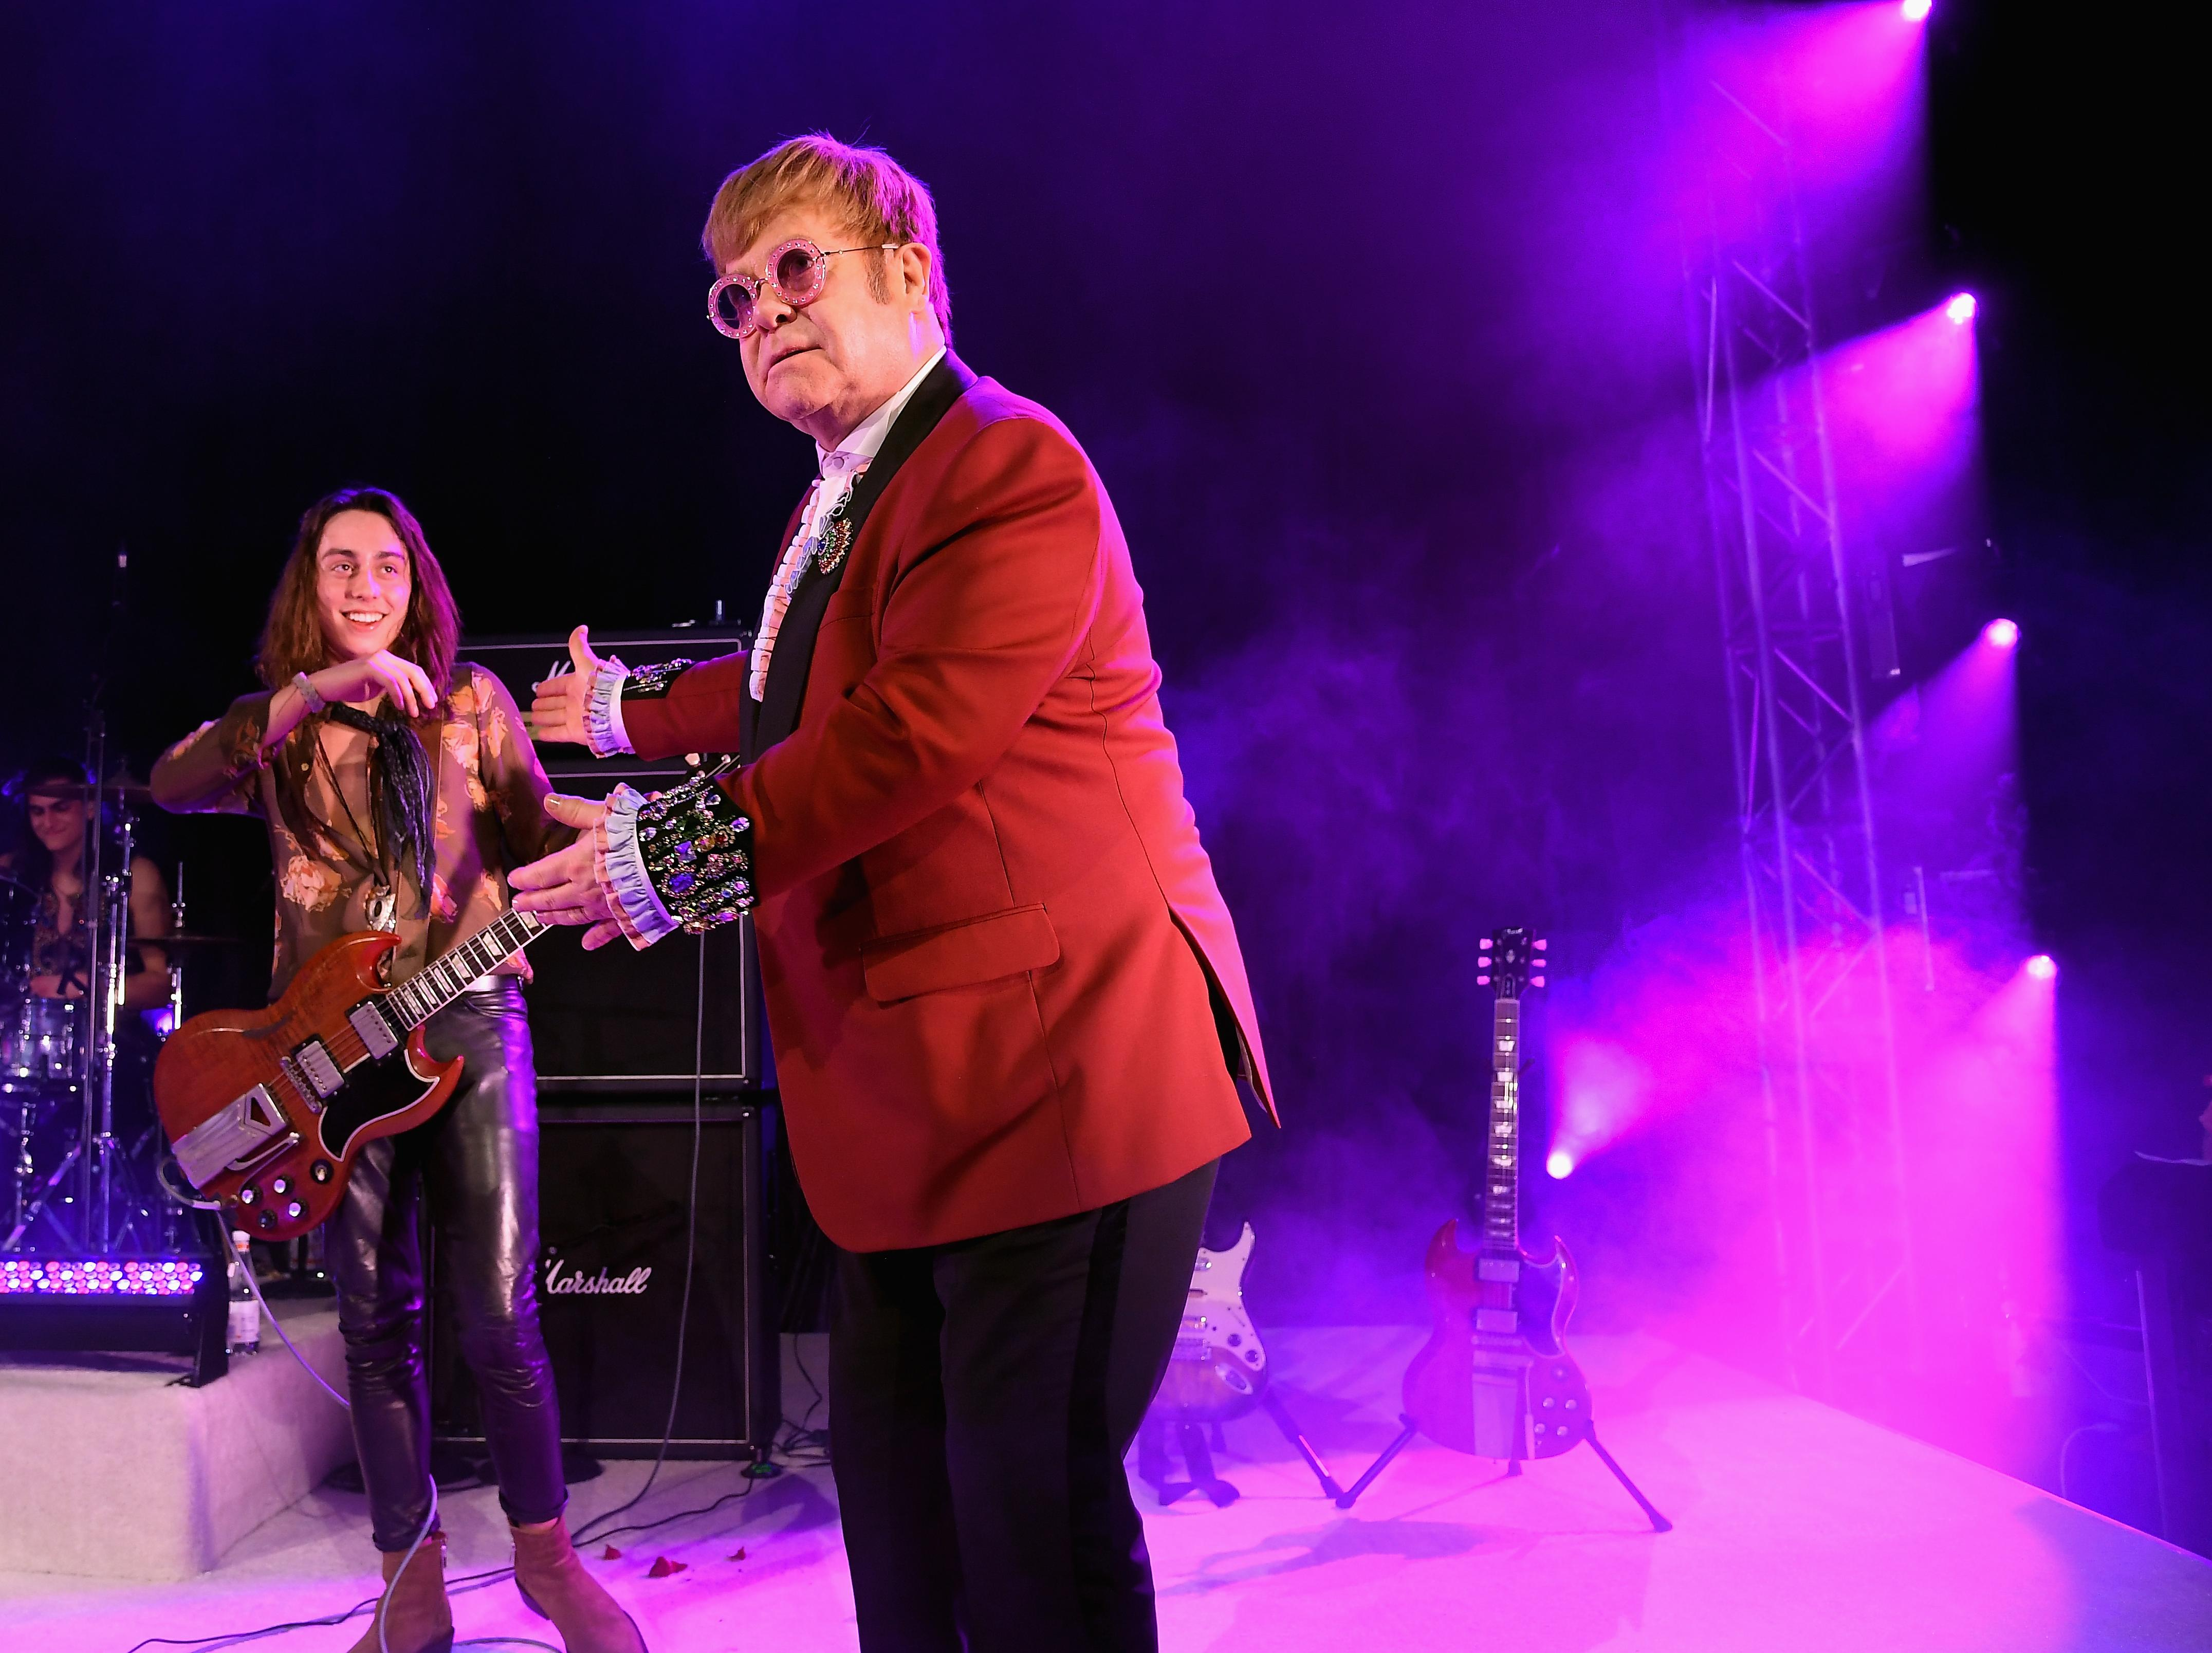 Watch Elton John jam with the 'amazing' Greta Van Fleet at his Oscars party